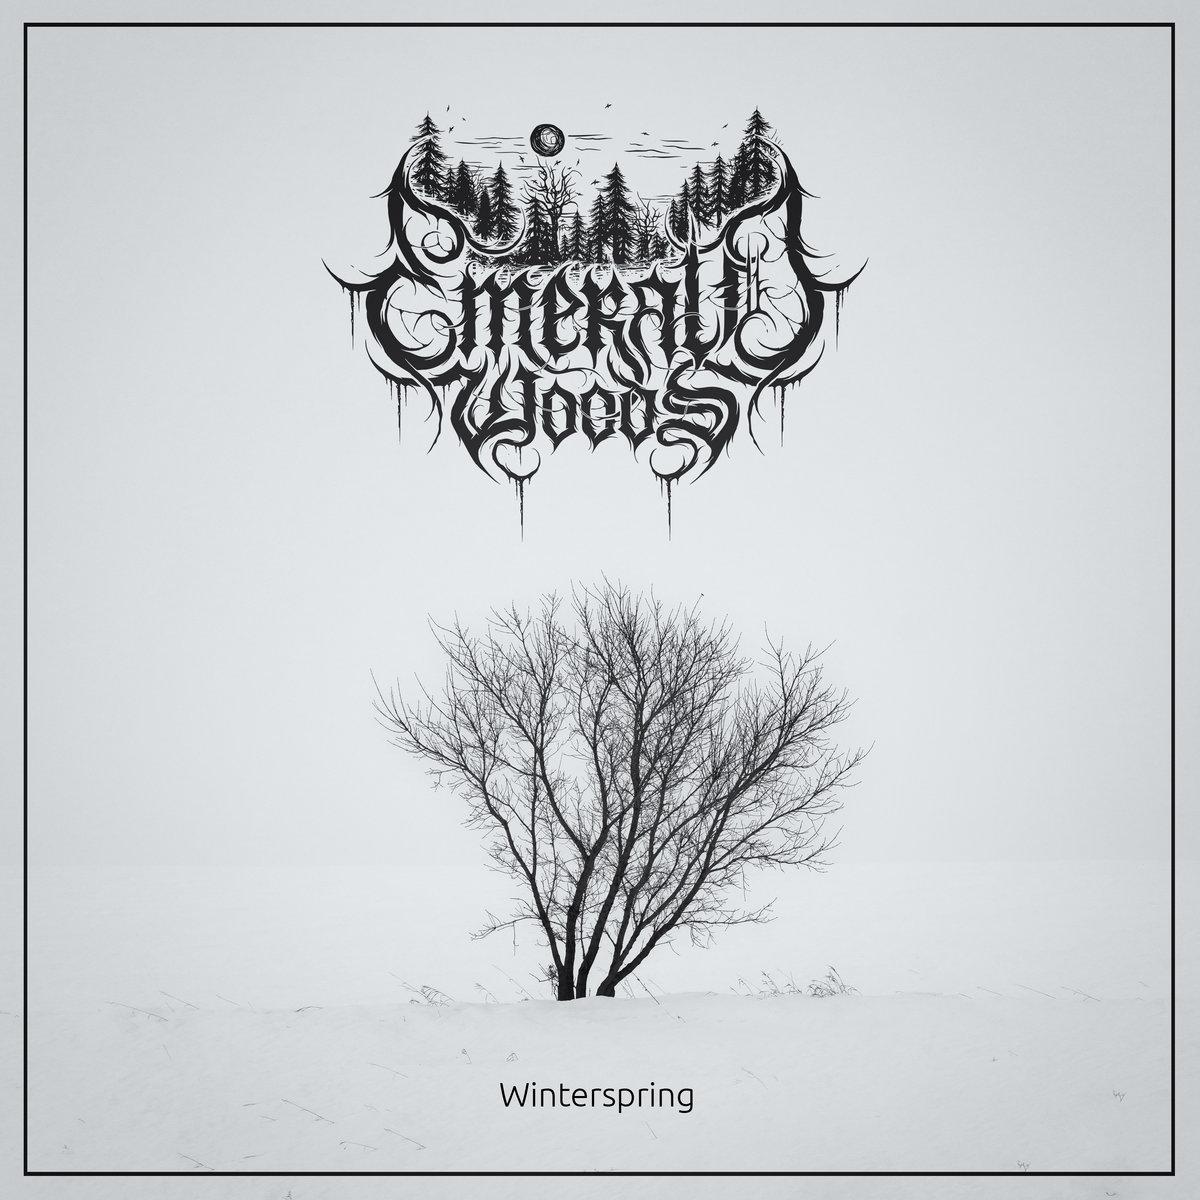 Emerald Woods - Winterspring (2021)